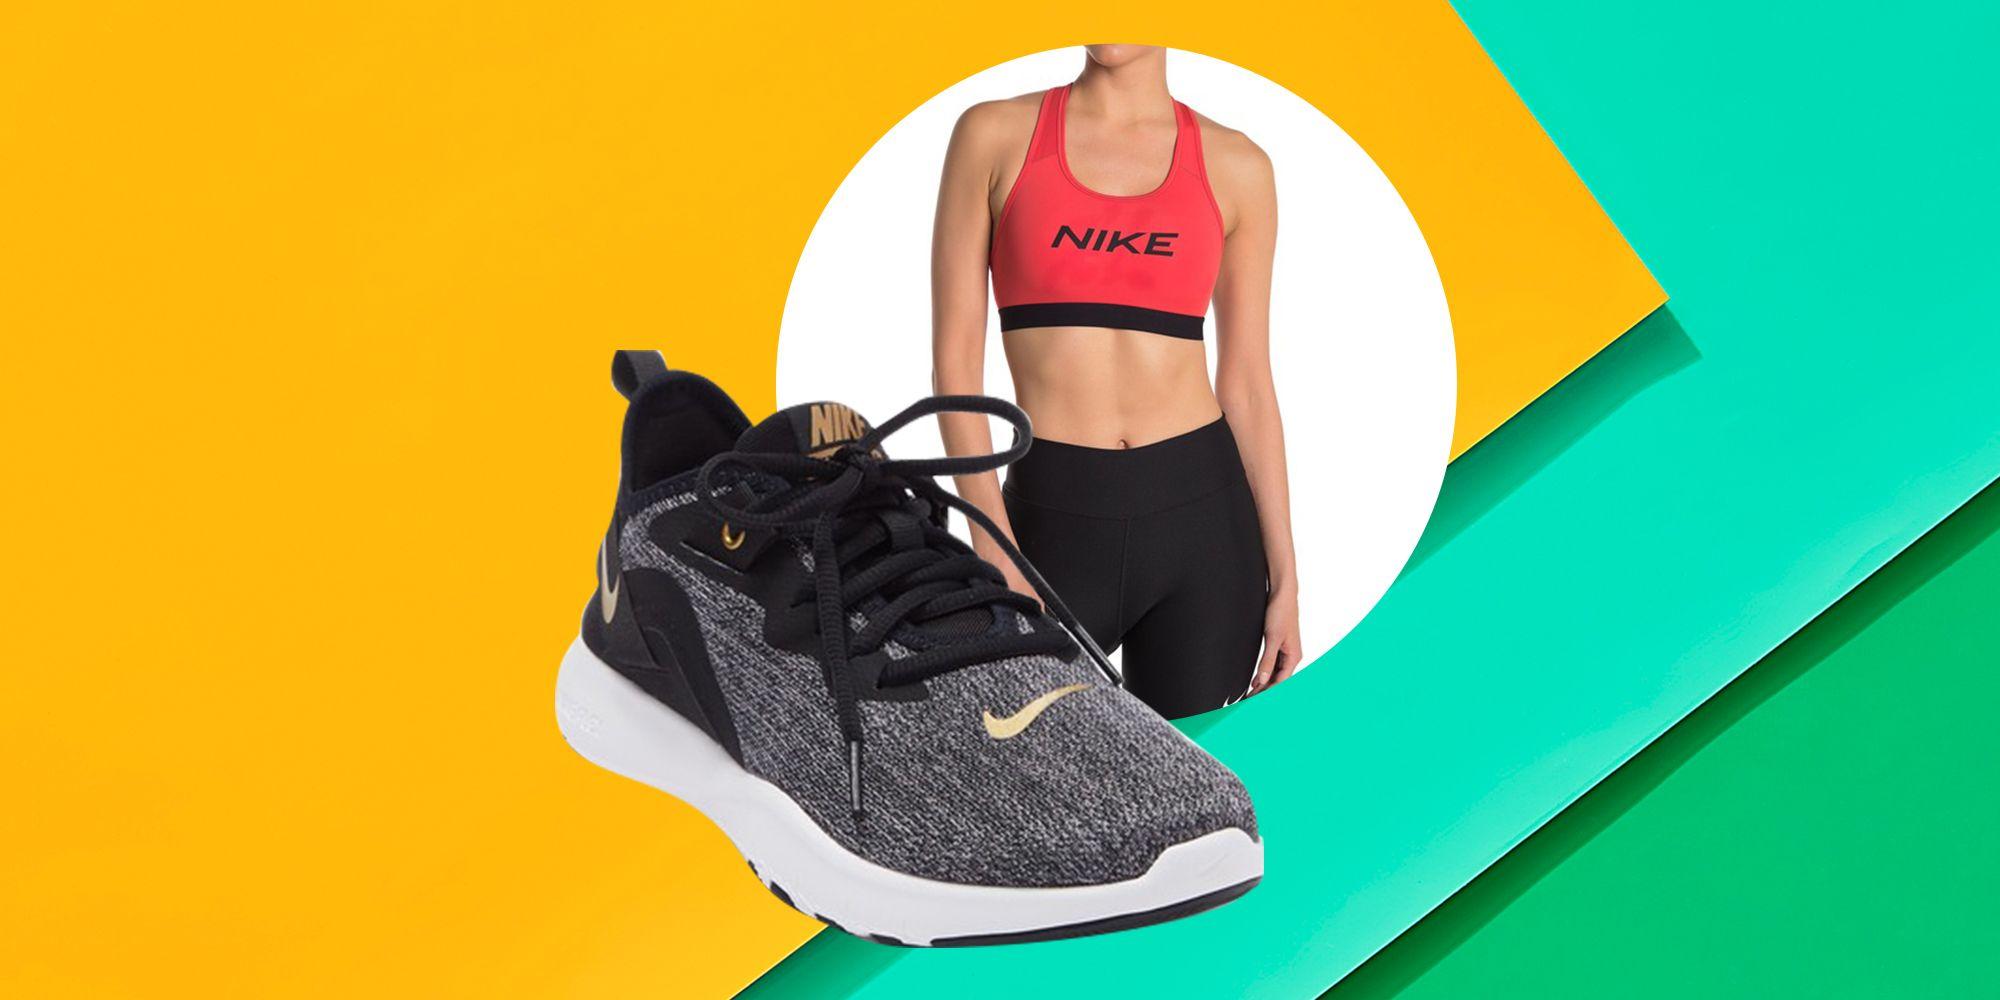 Nordstrom Rack Sale Features Huge Nike Activewear Price Cuts